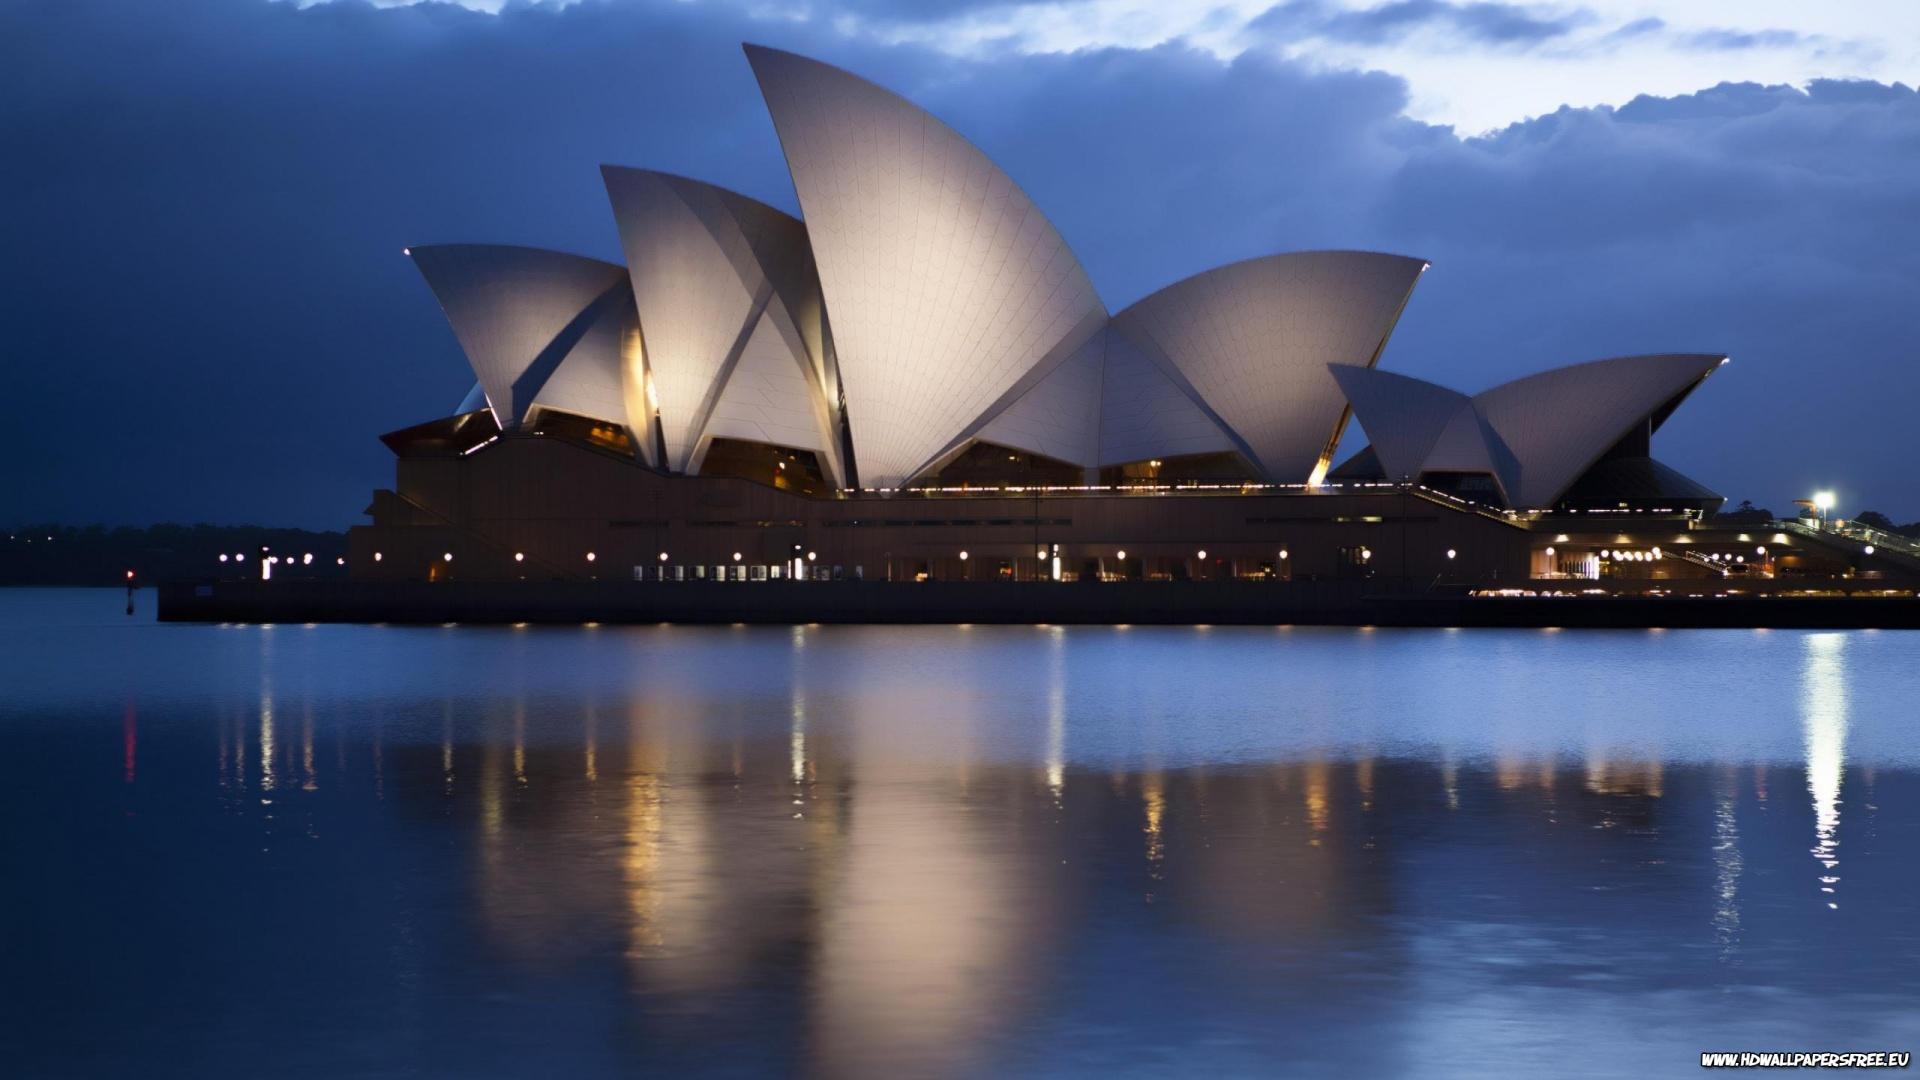 Sydney Opera House Wallpaper 1920x1080